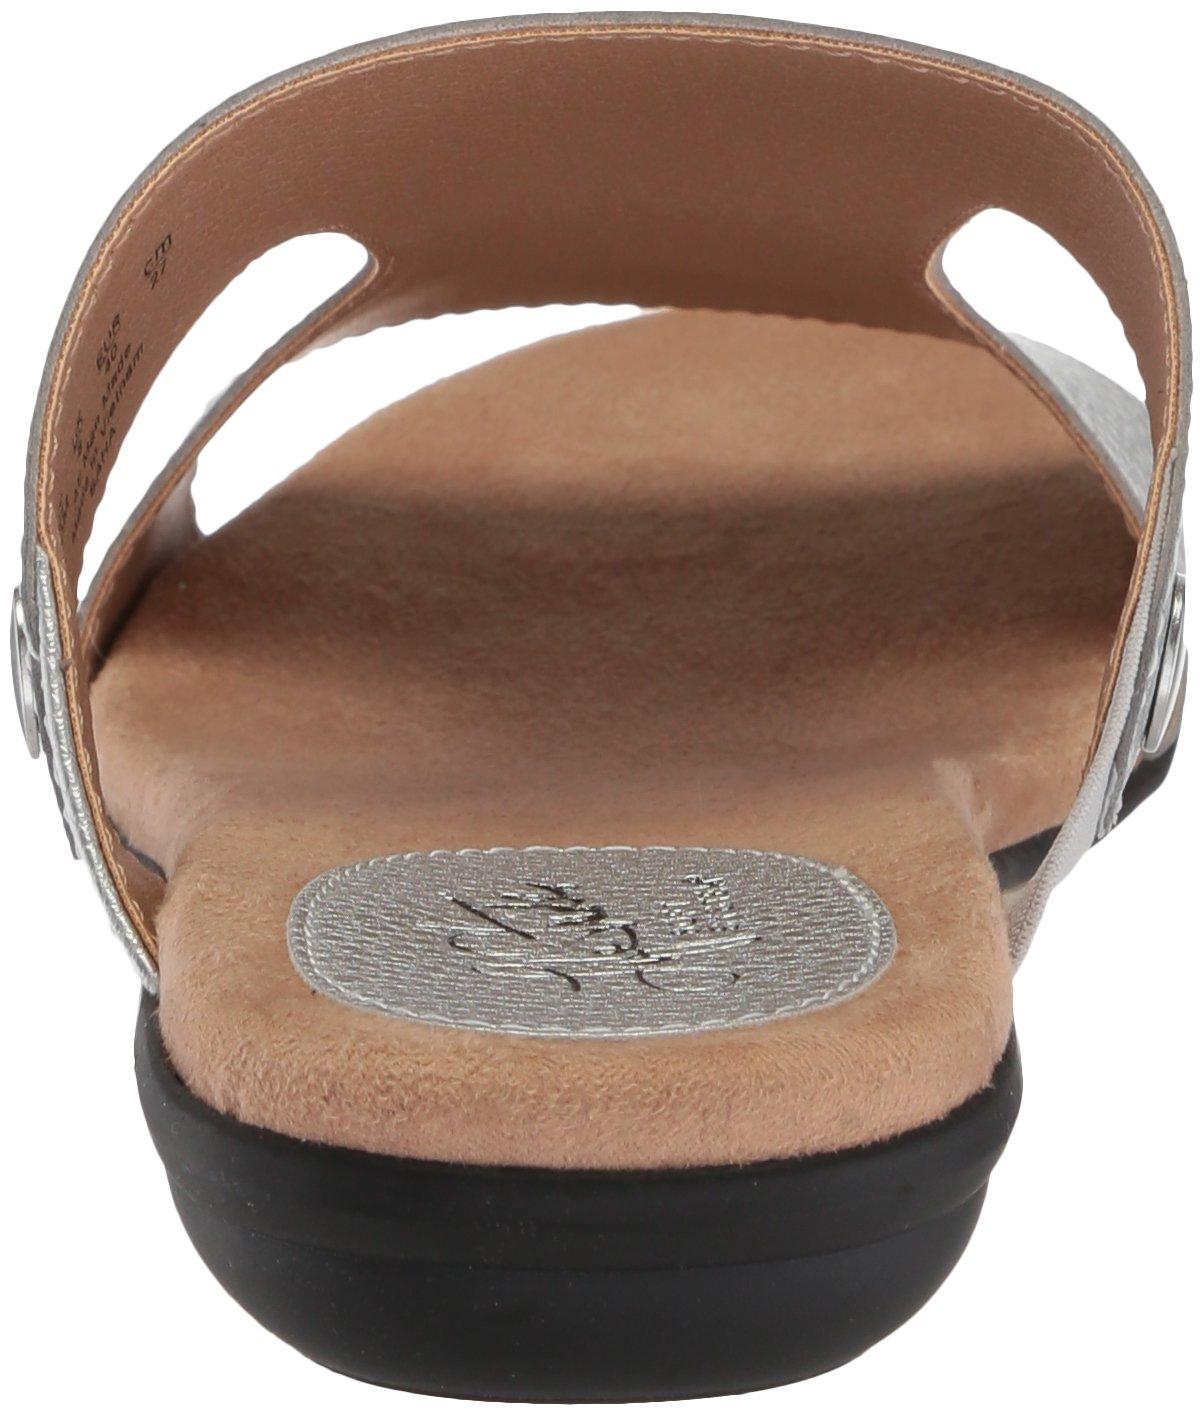 LifeStride Women's BAHA BAHA Women's Flat Sandal B0775YG4FT 7.5 W US|Silver a5a949